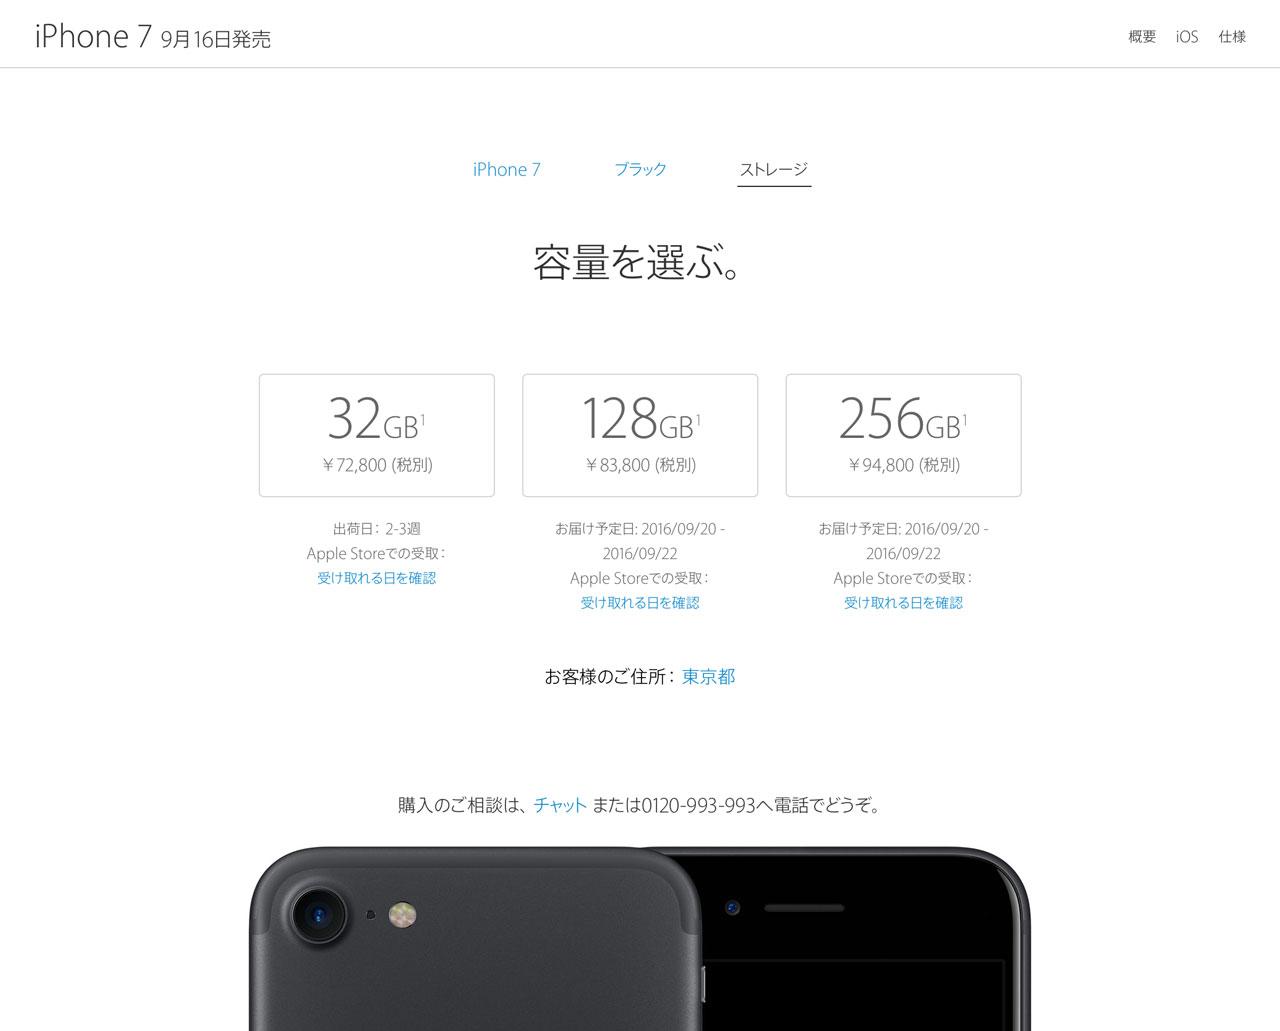 iphone-7-apple-store-japan-4